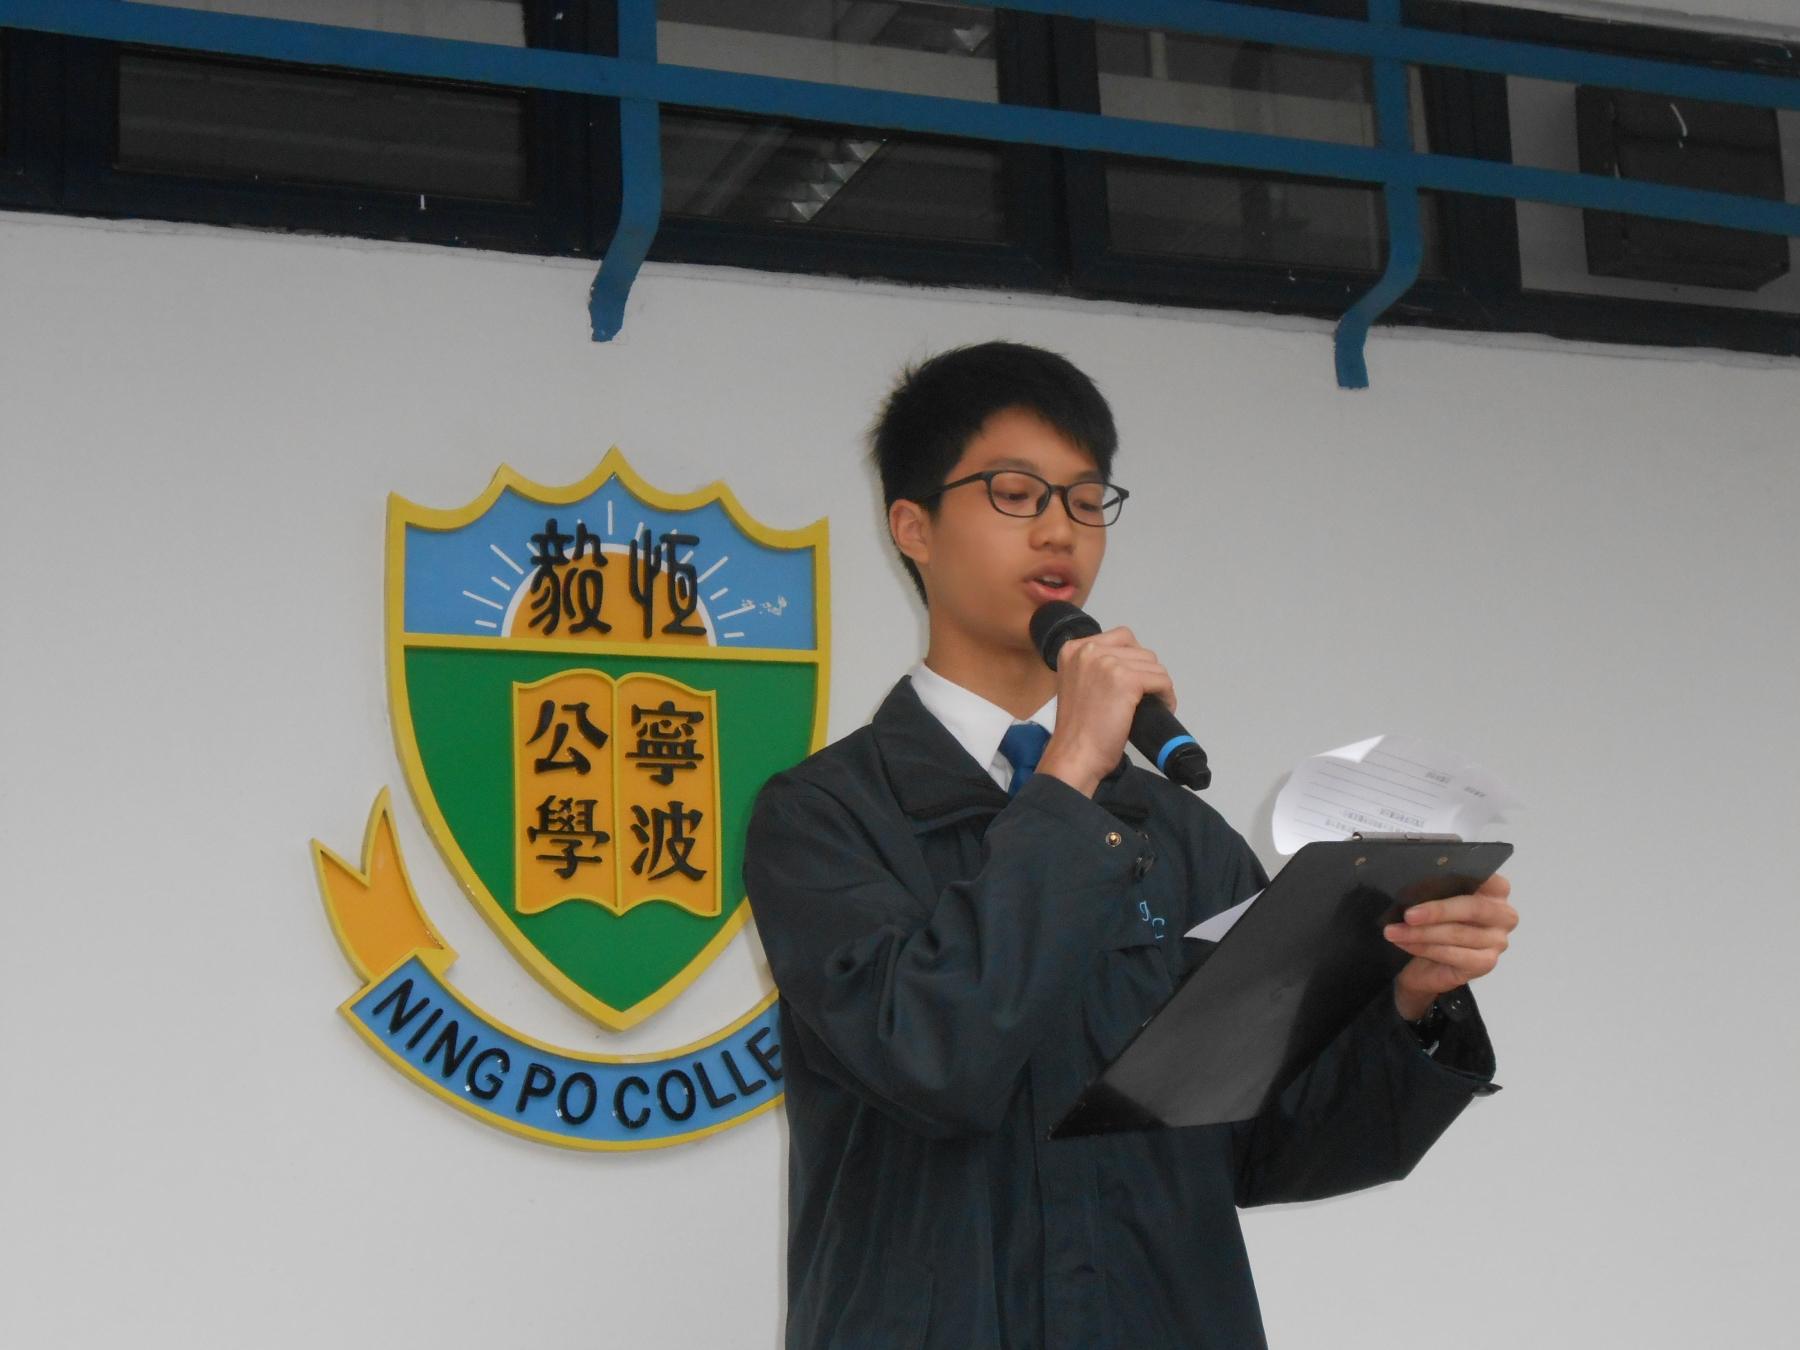 http://npc.edu.hk/sites/default/files/dscn9018_2.jpg